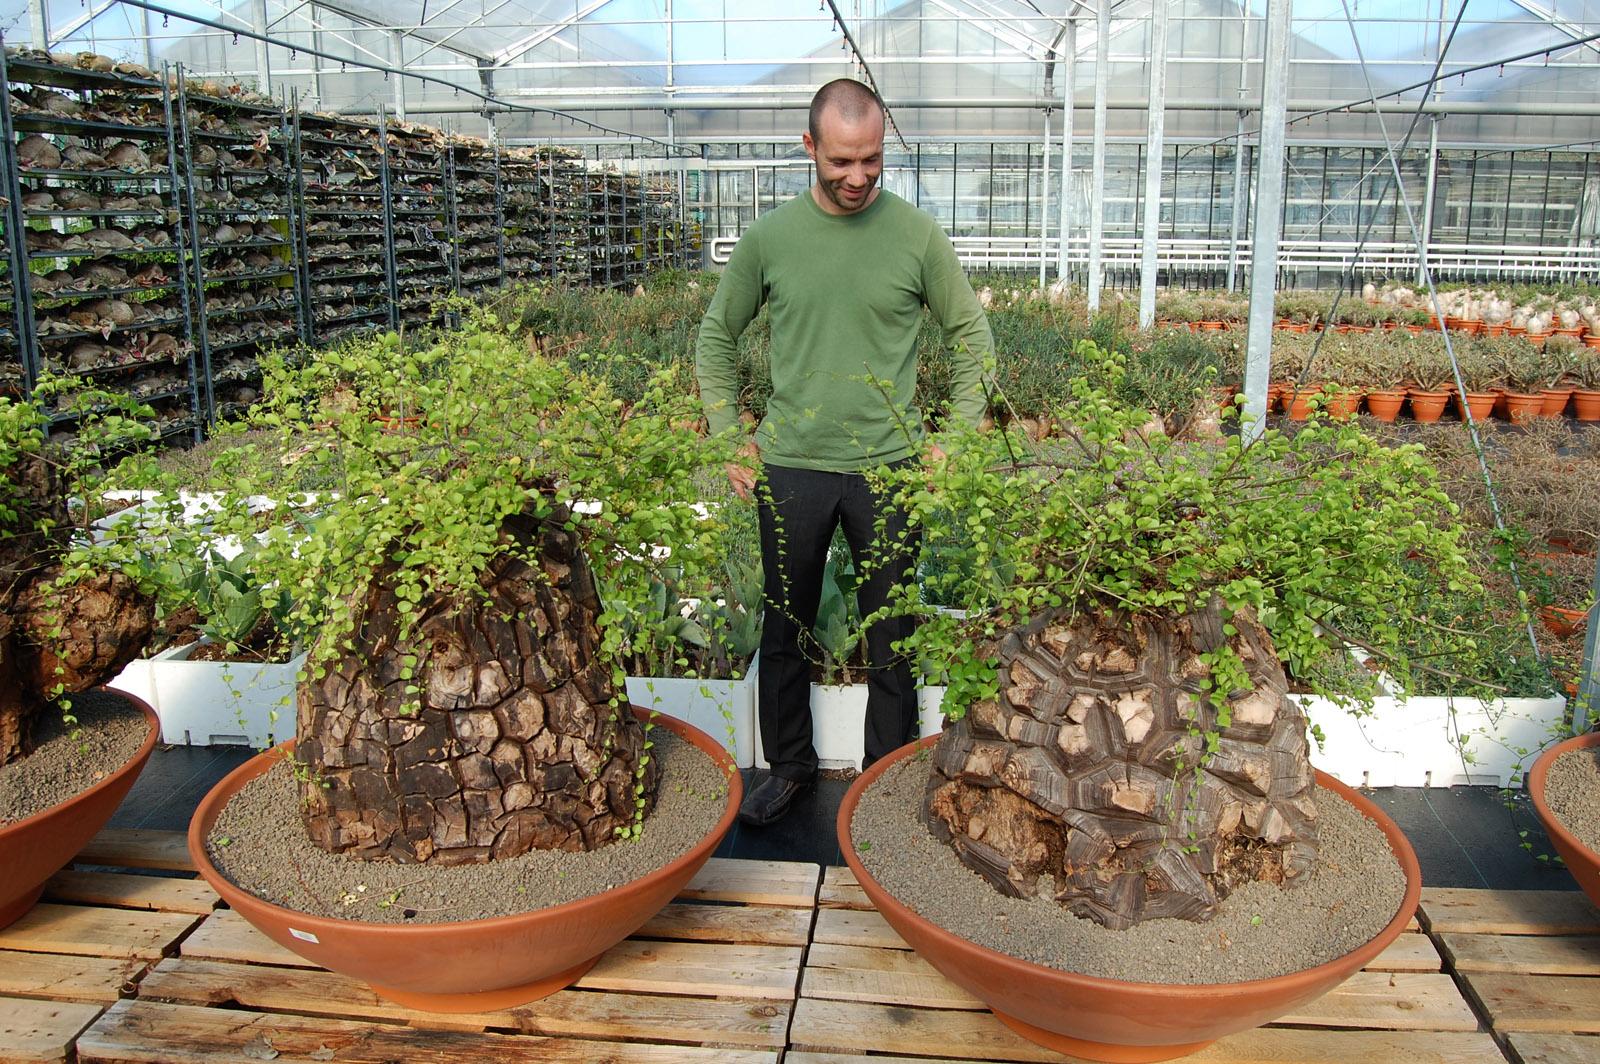 Jardin de aloes cactus ariane b lgica for Vivero de cactus